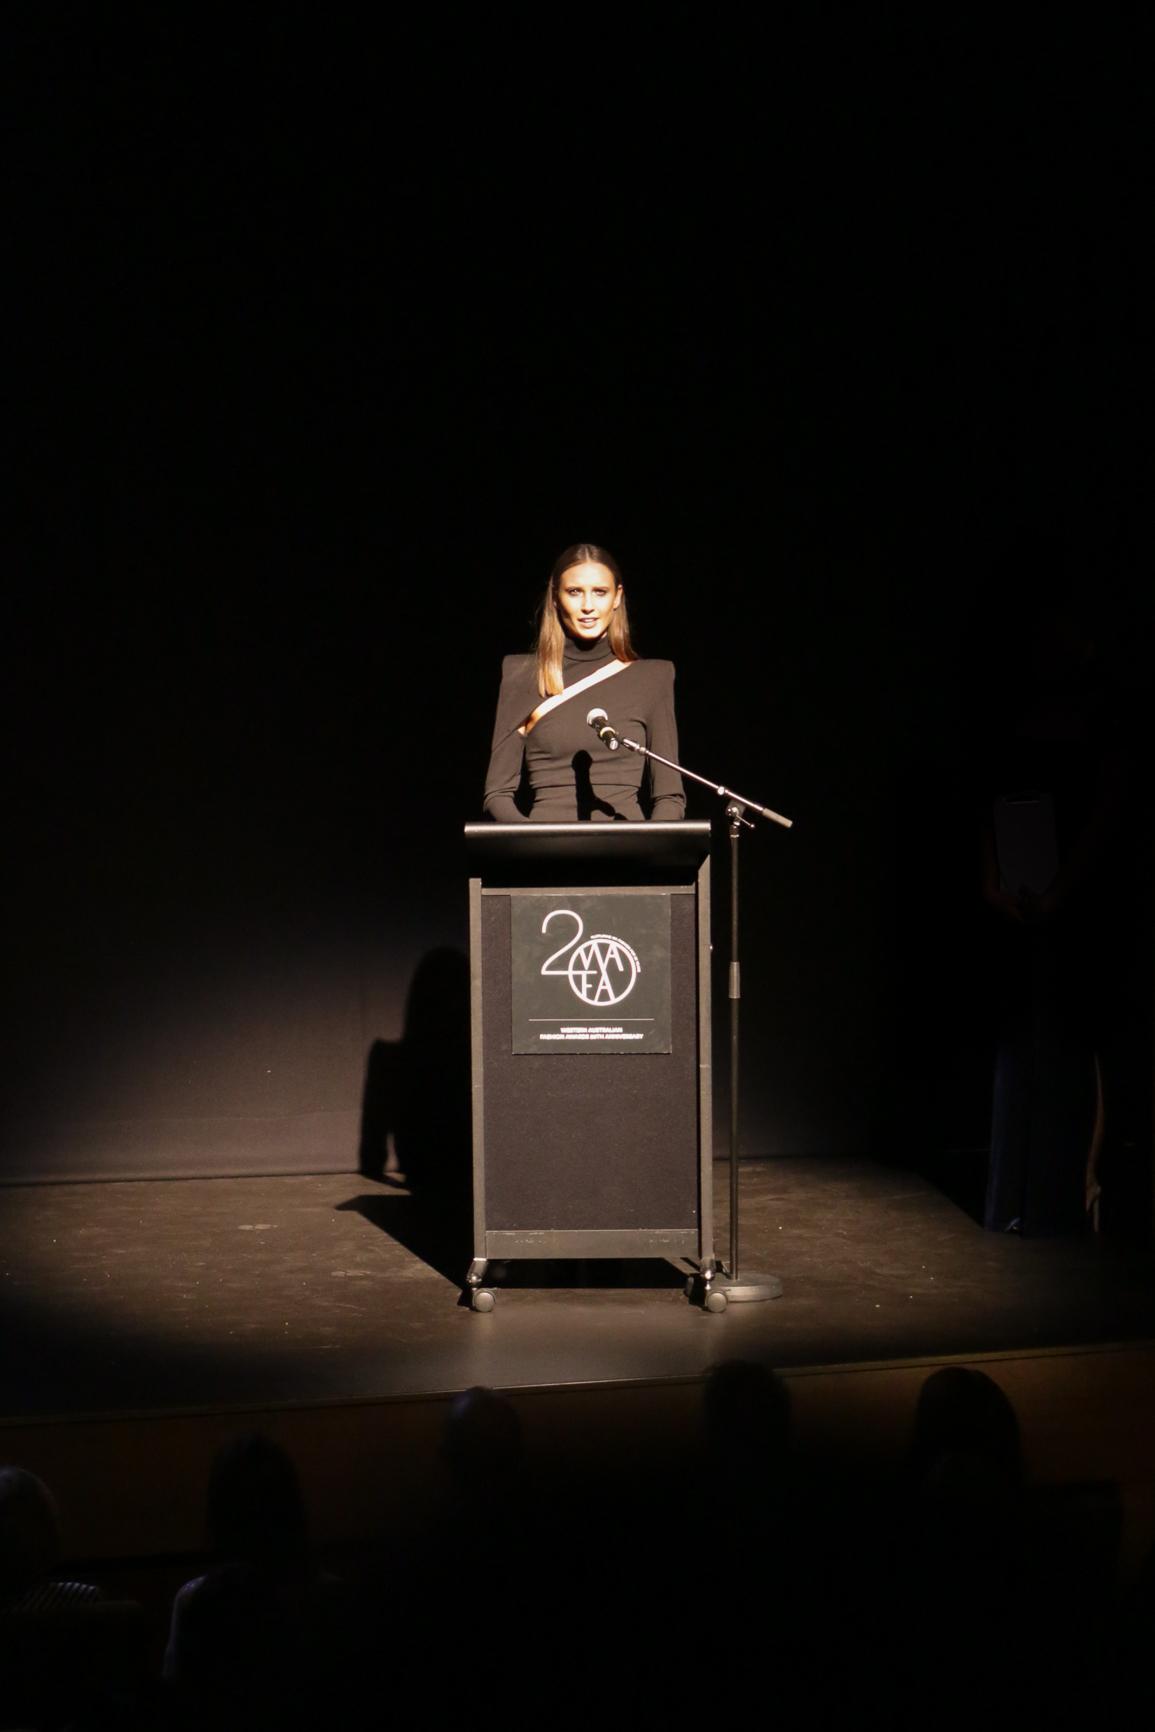 Claudia Todman - Model of the Year  (cheekbones, wow)